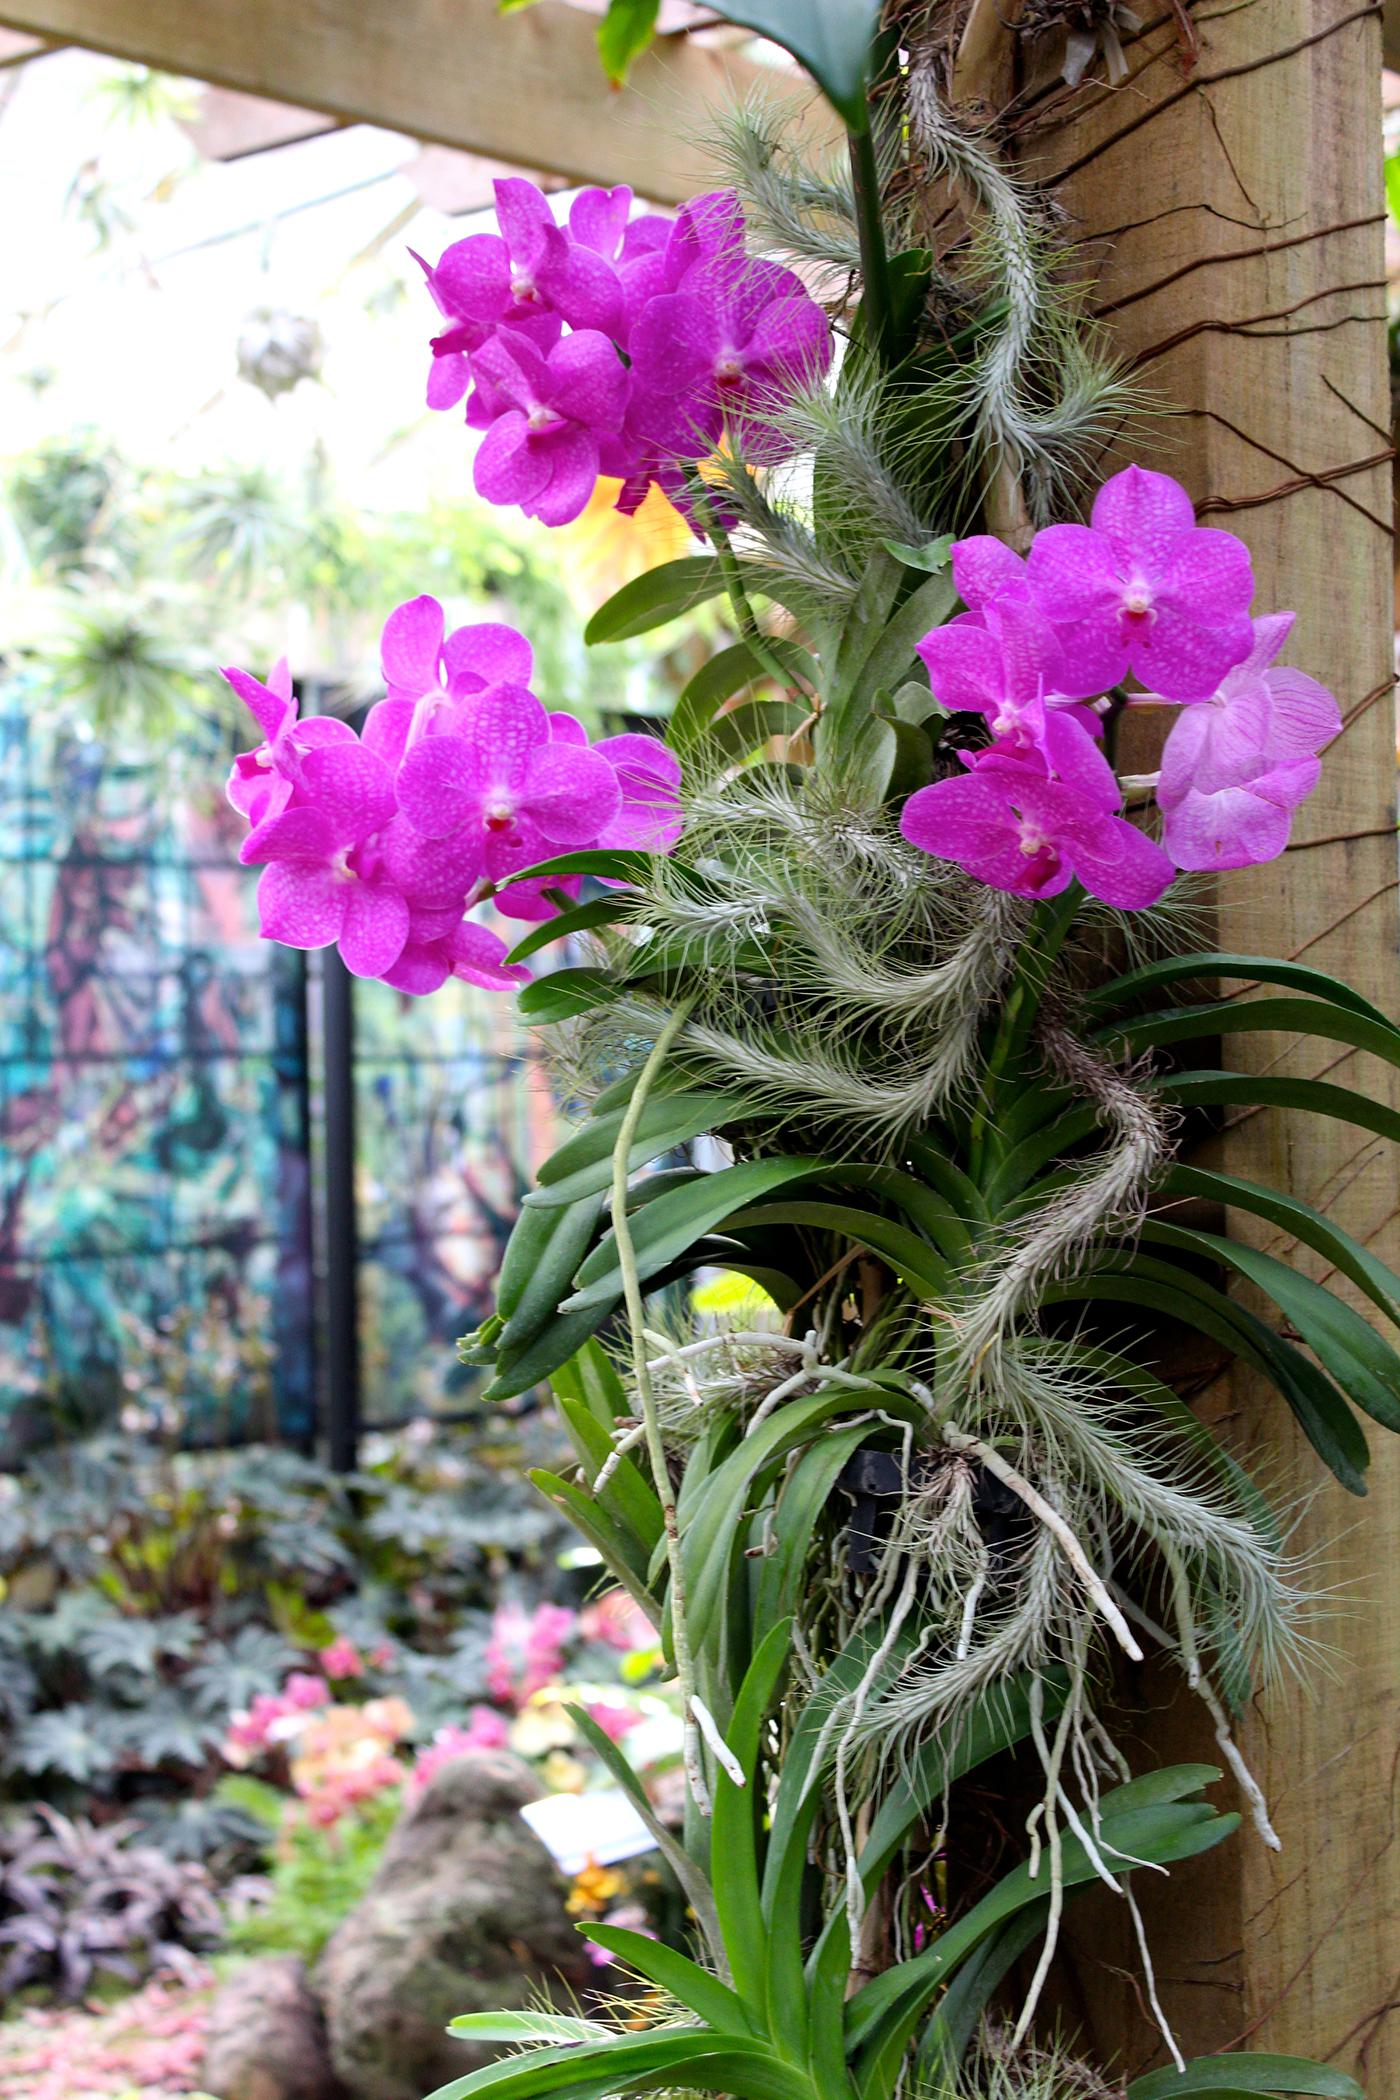 A Botanical Garden Blooms with Chagall Artes & contextos Selby10